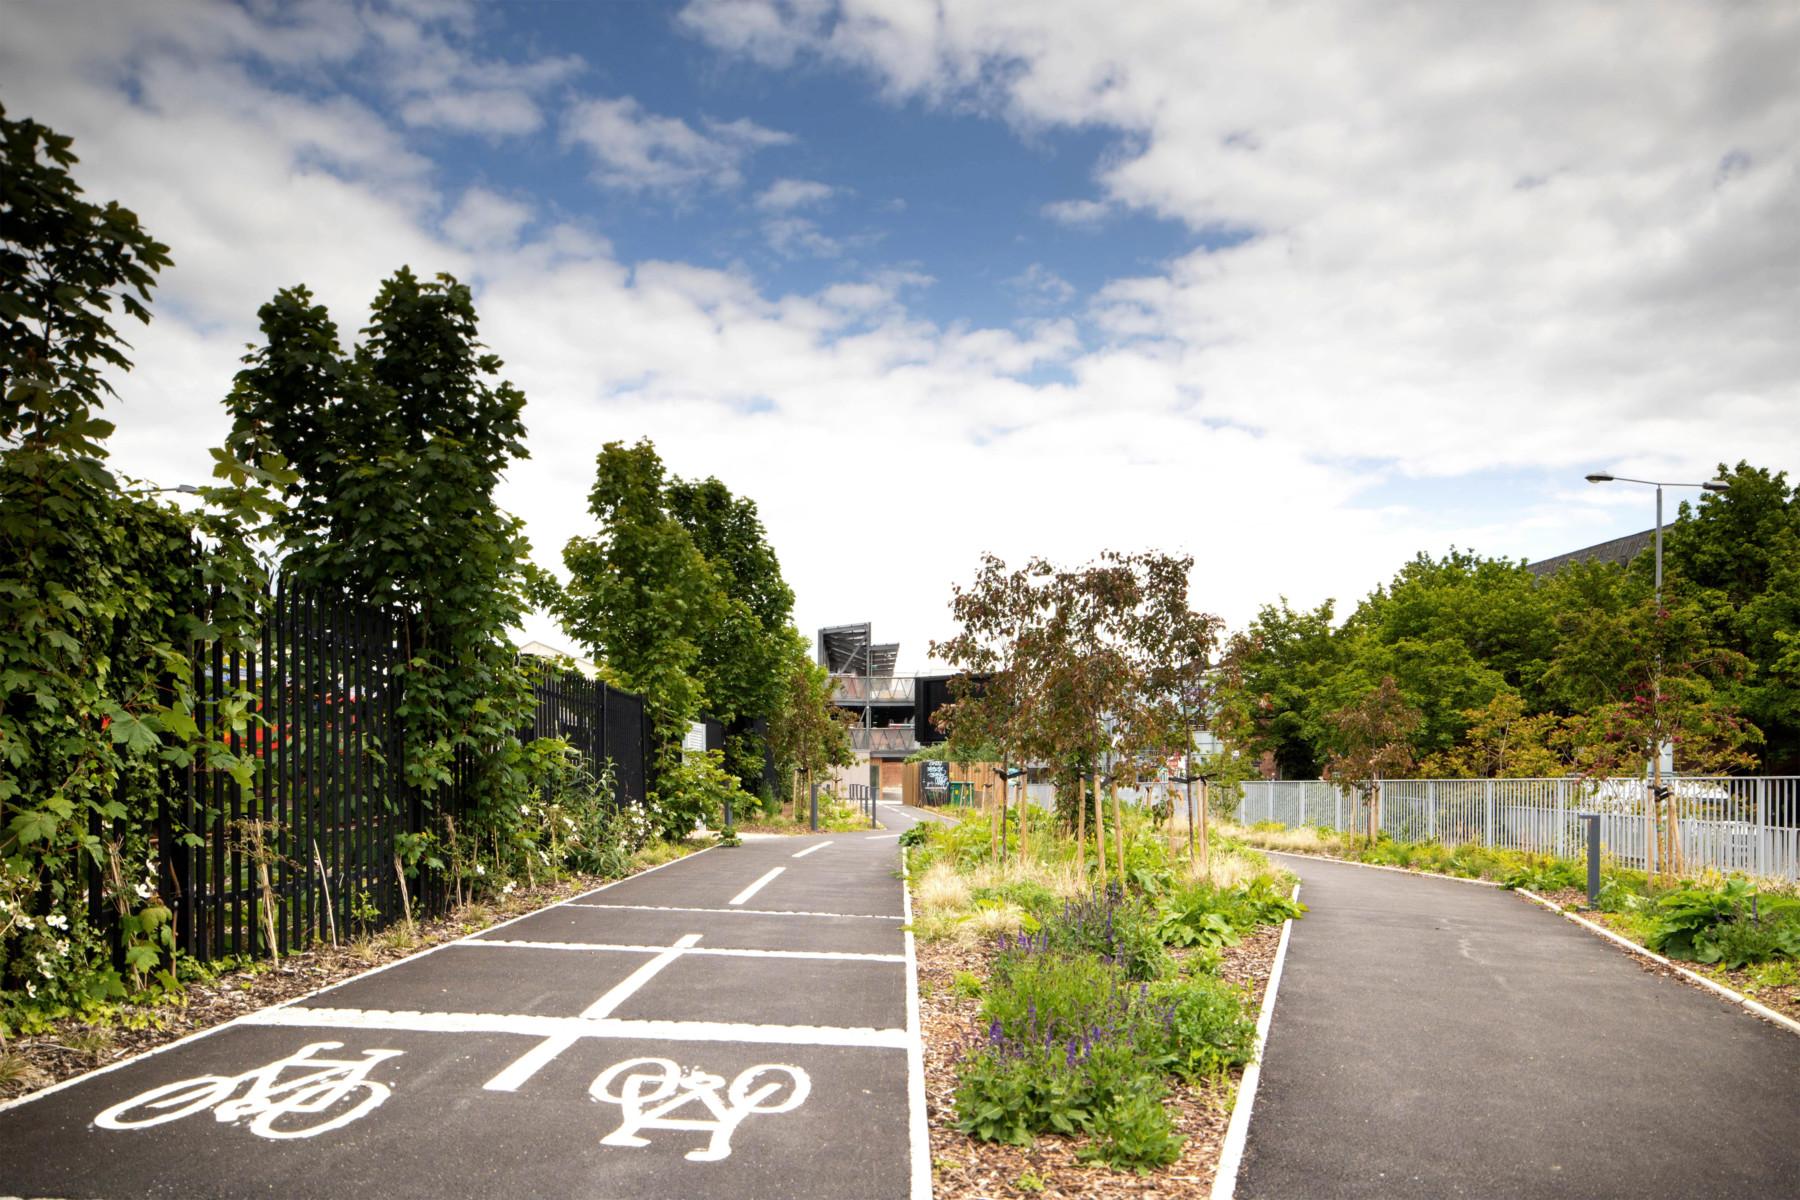 Sarah-Wigglesworth-Architects Kingston-Go-Cycle Path planting  3600x2200